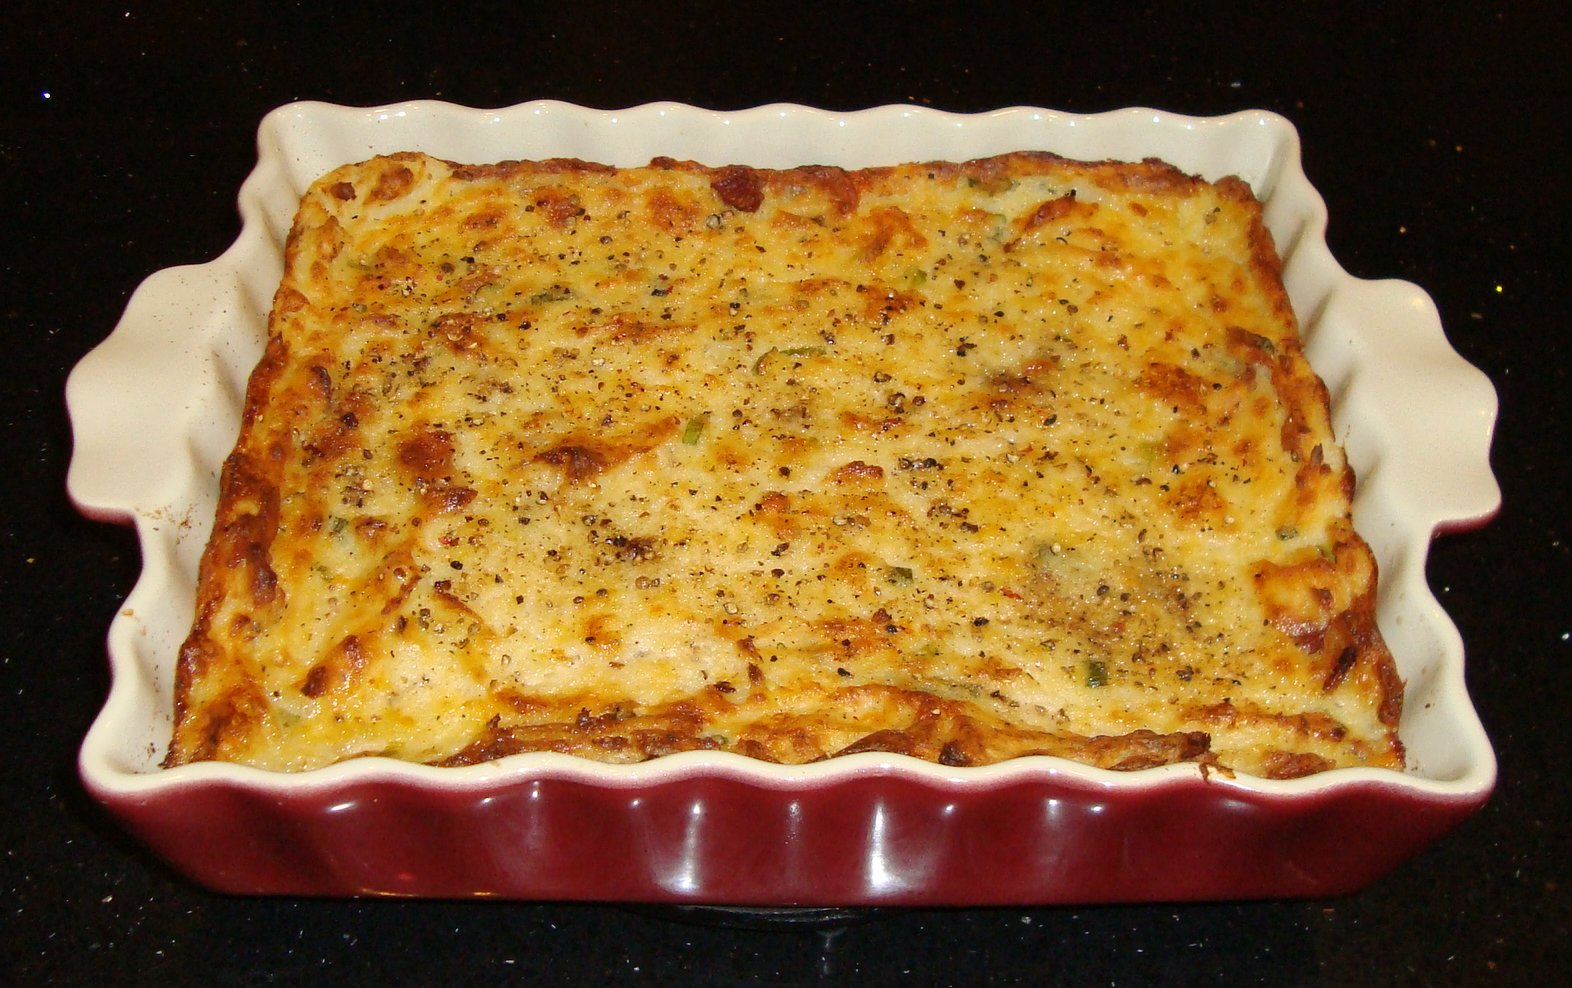 Sarah's Kitchen: Loaded Mashed Potato Casserole